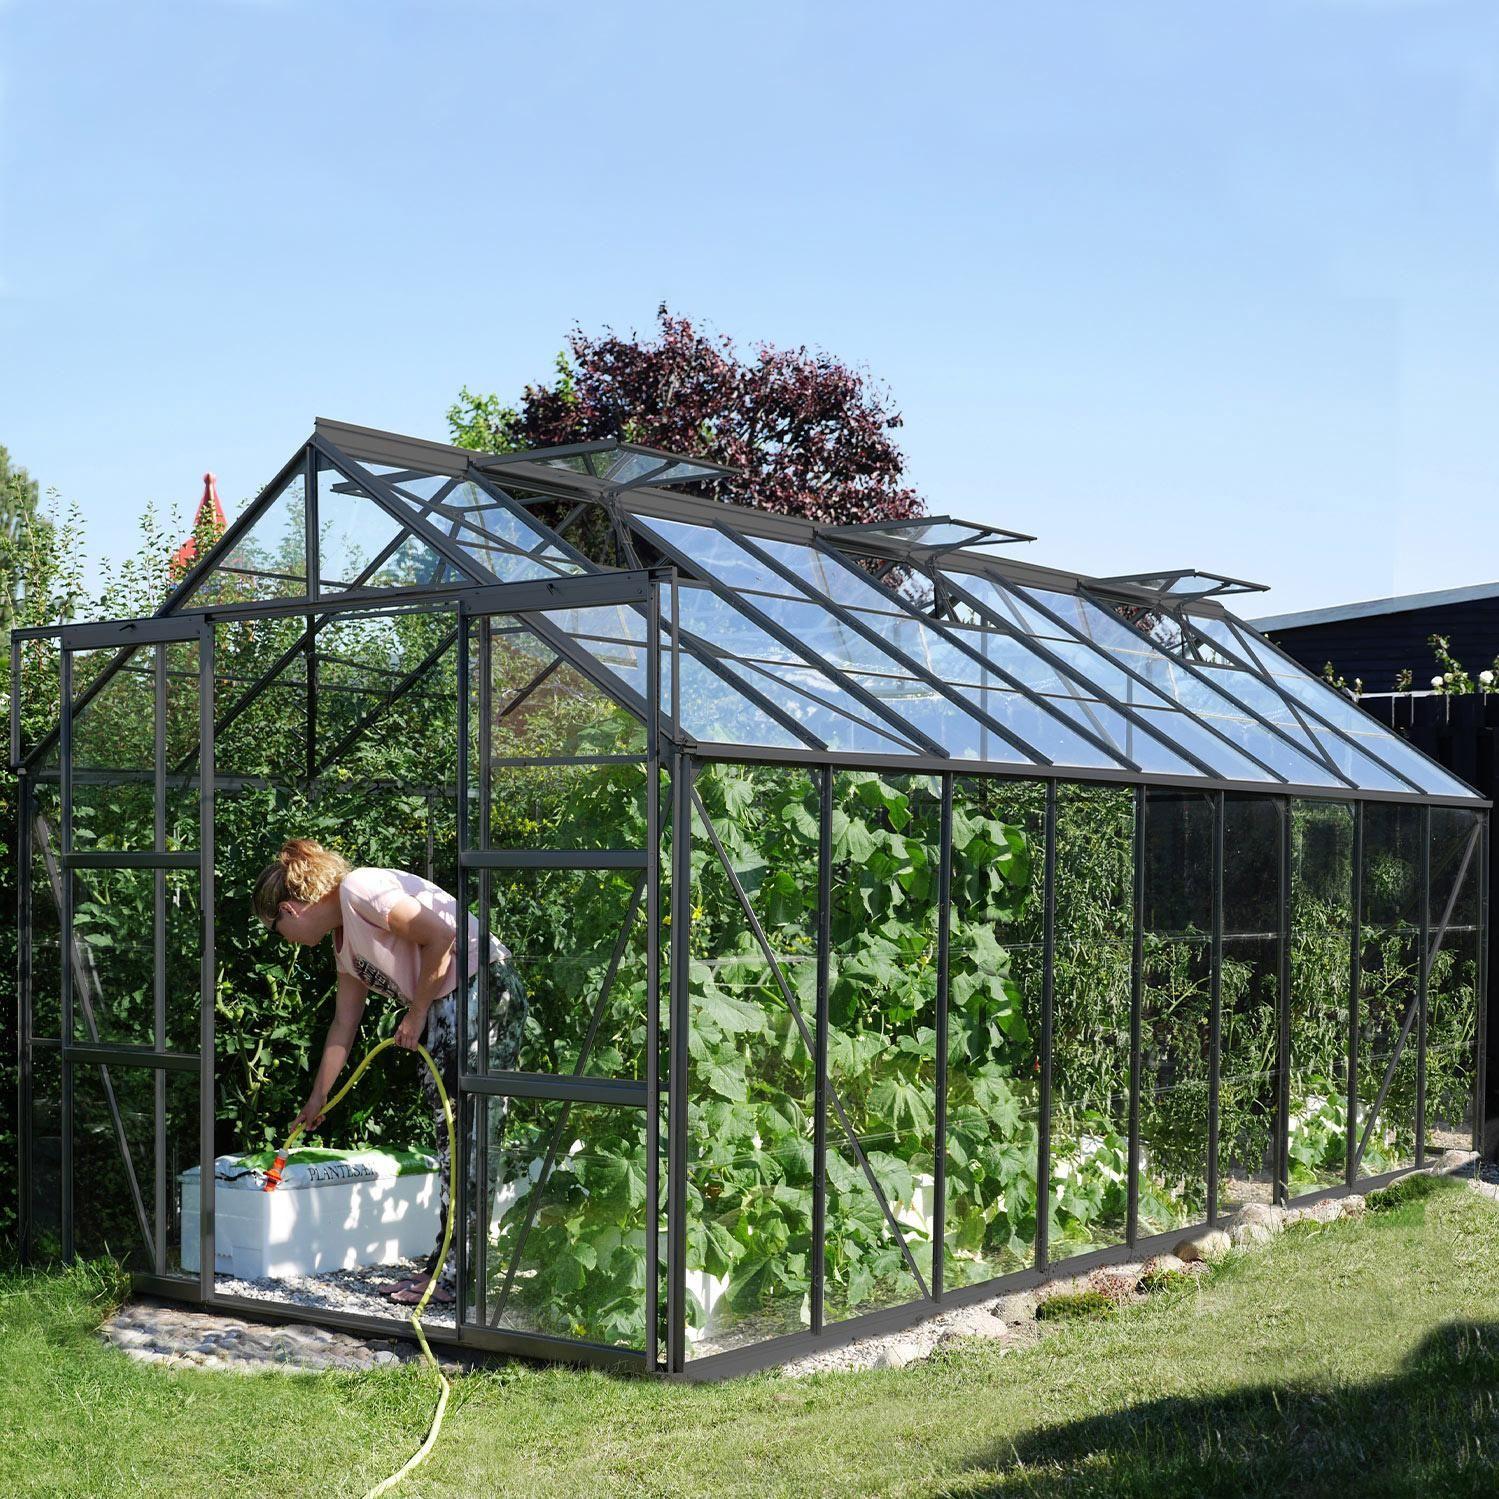 Serre De Jardin En Verre Trempe 3mm Lams Laurus Uranus 14500 Anthracite 14 5 M Lams En 2020 Serre Jardin Jardins Et Paroi Verre